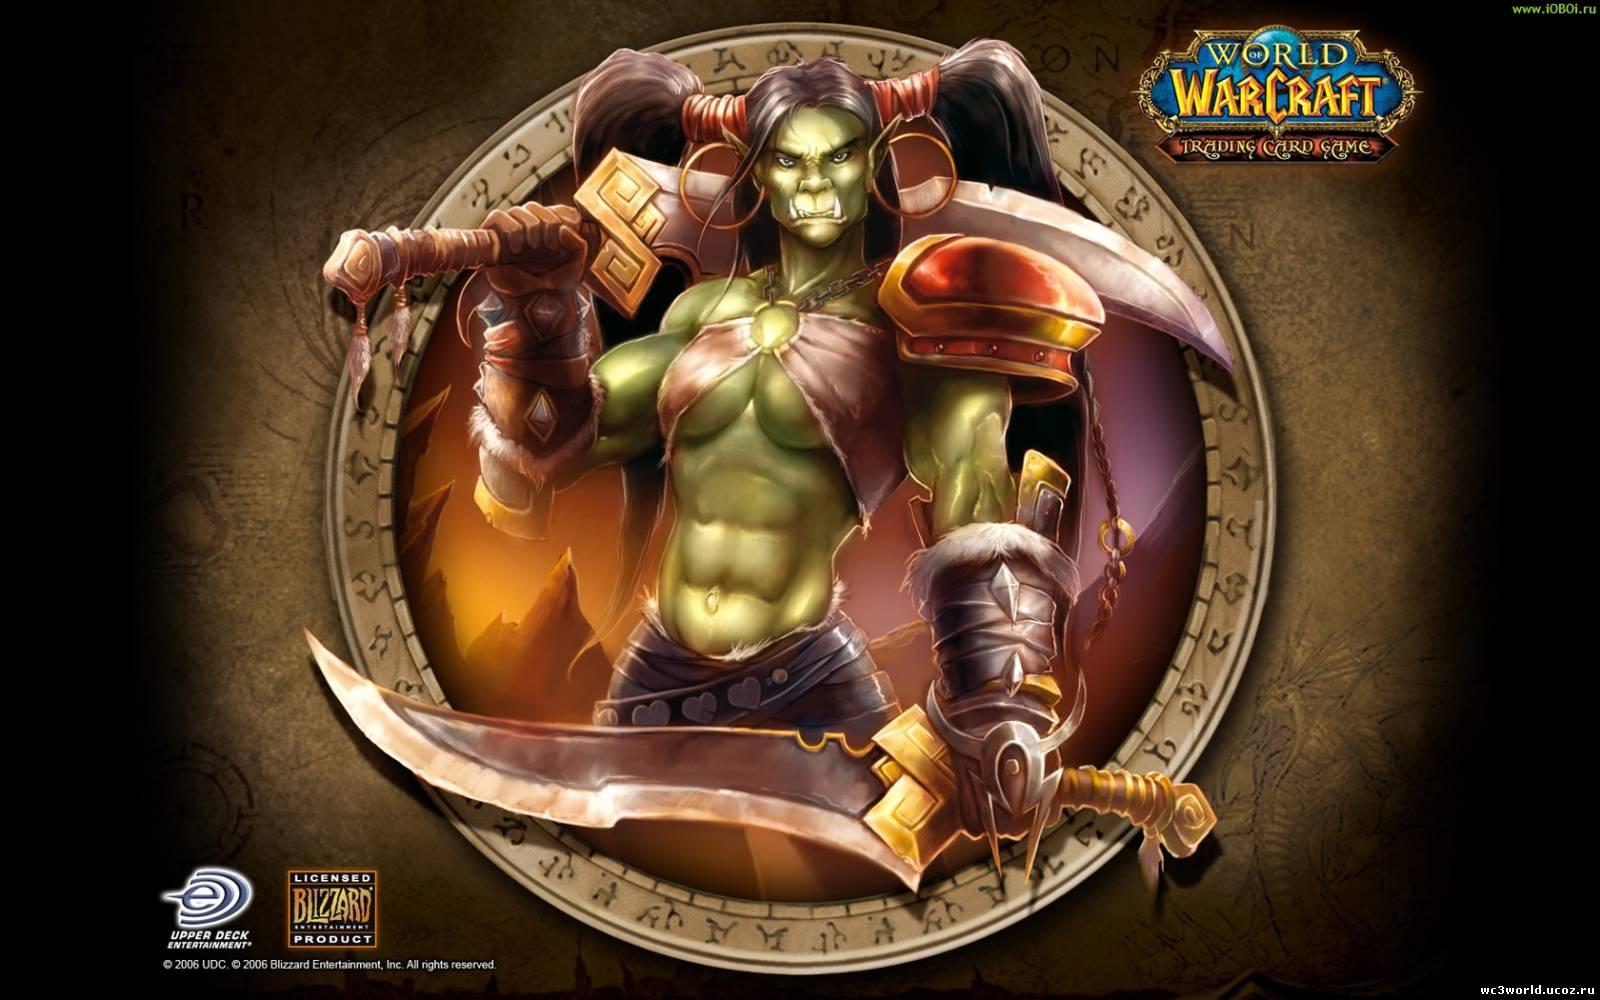 World of warcraft troll logo adult movie